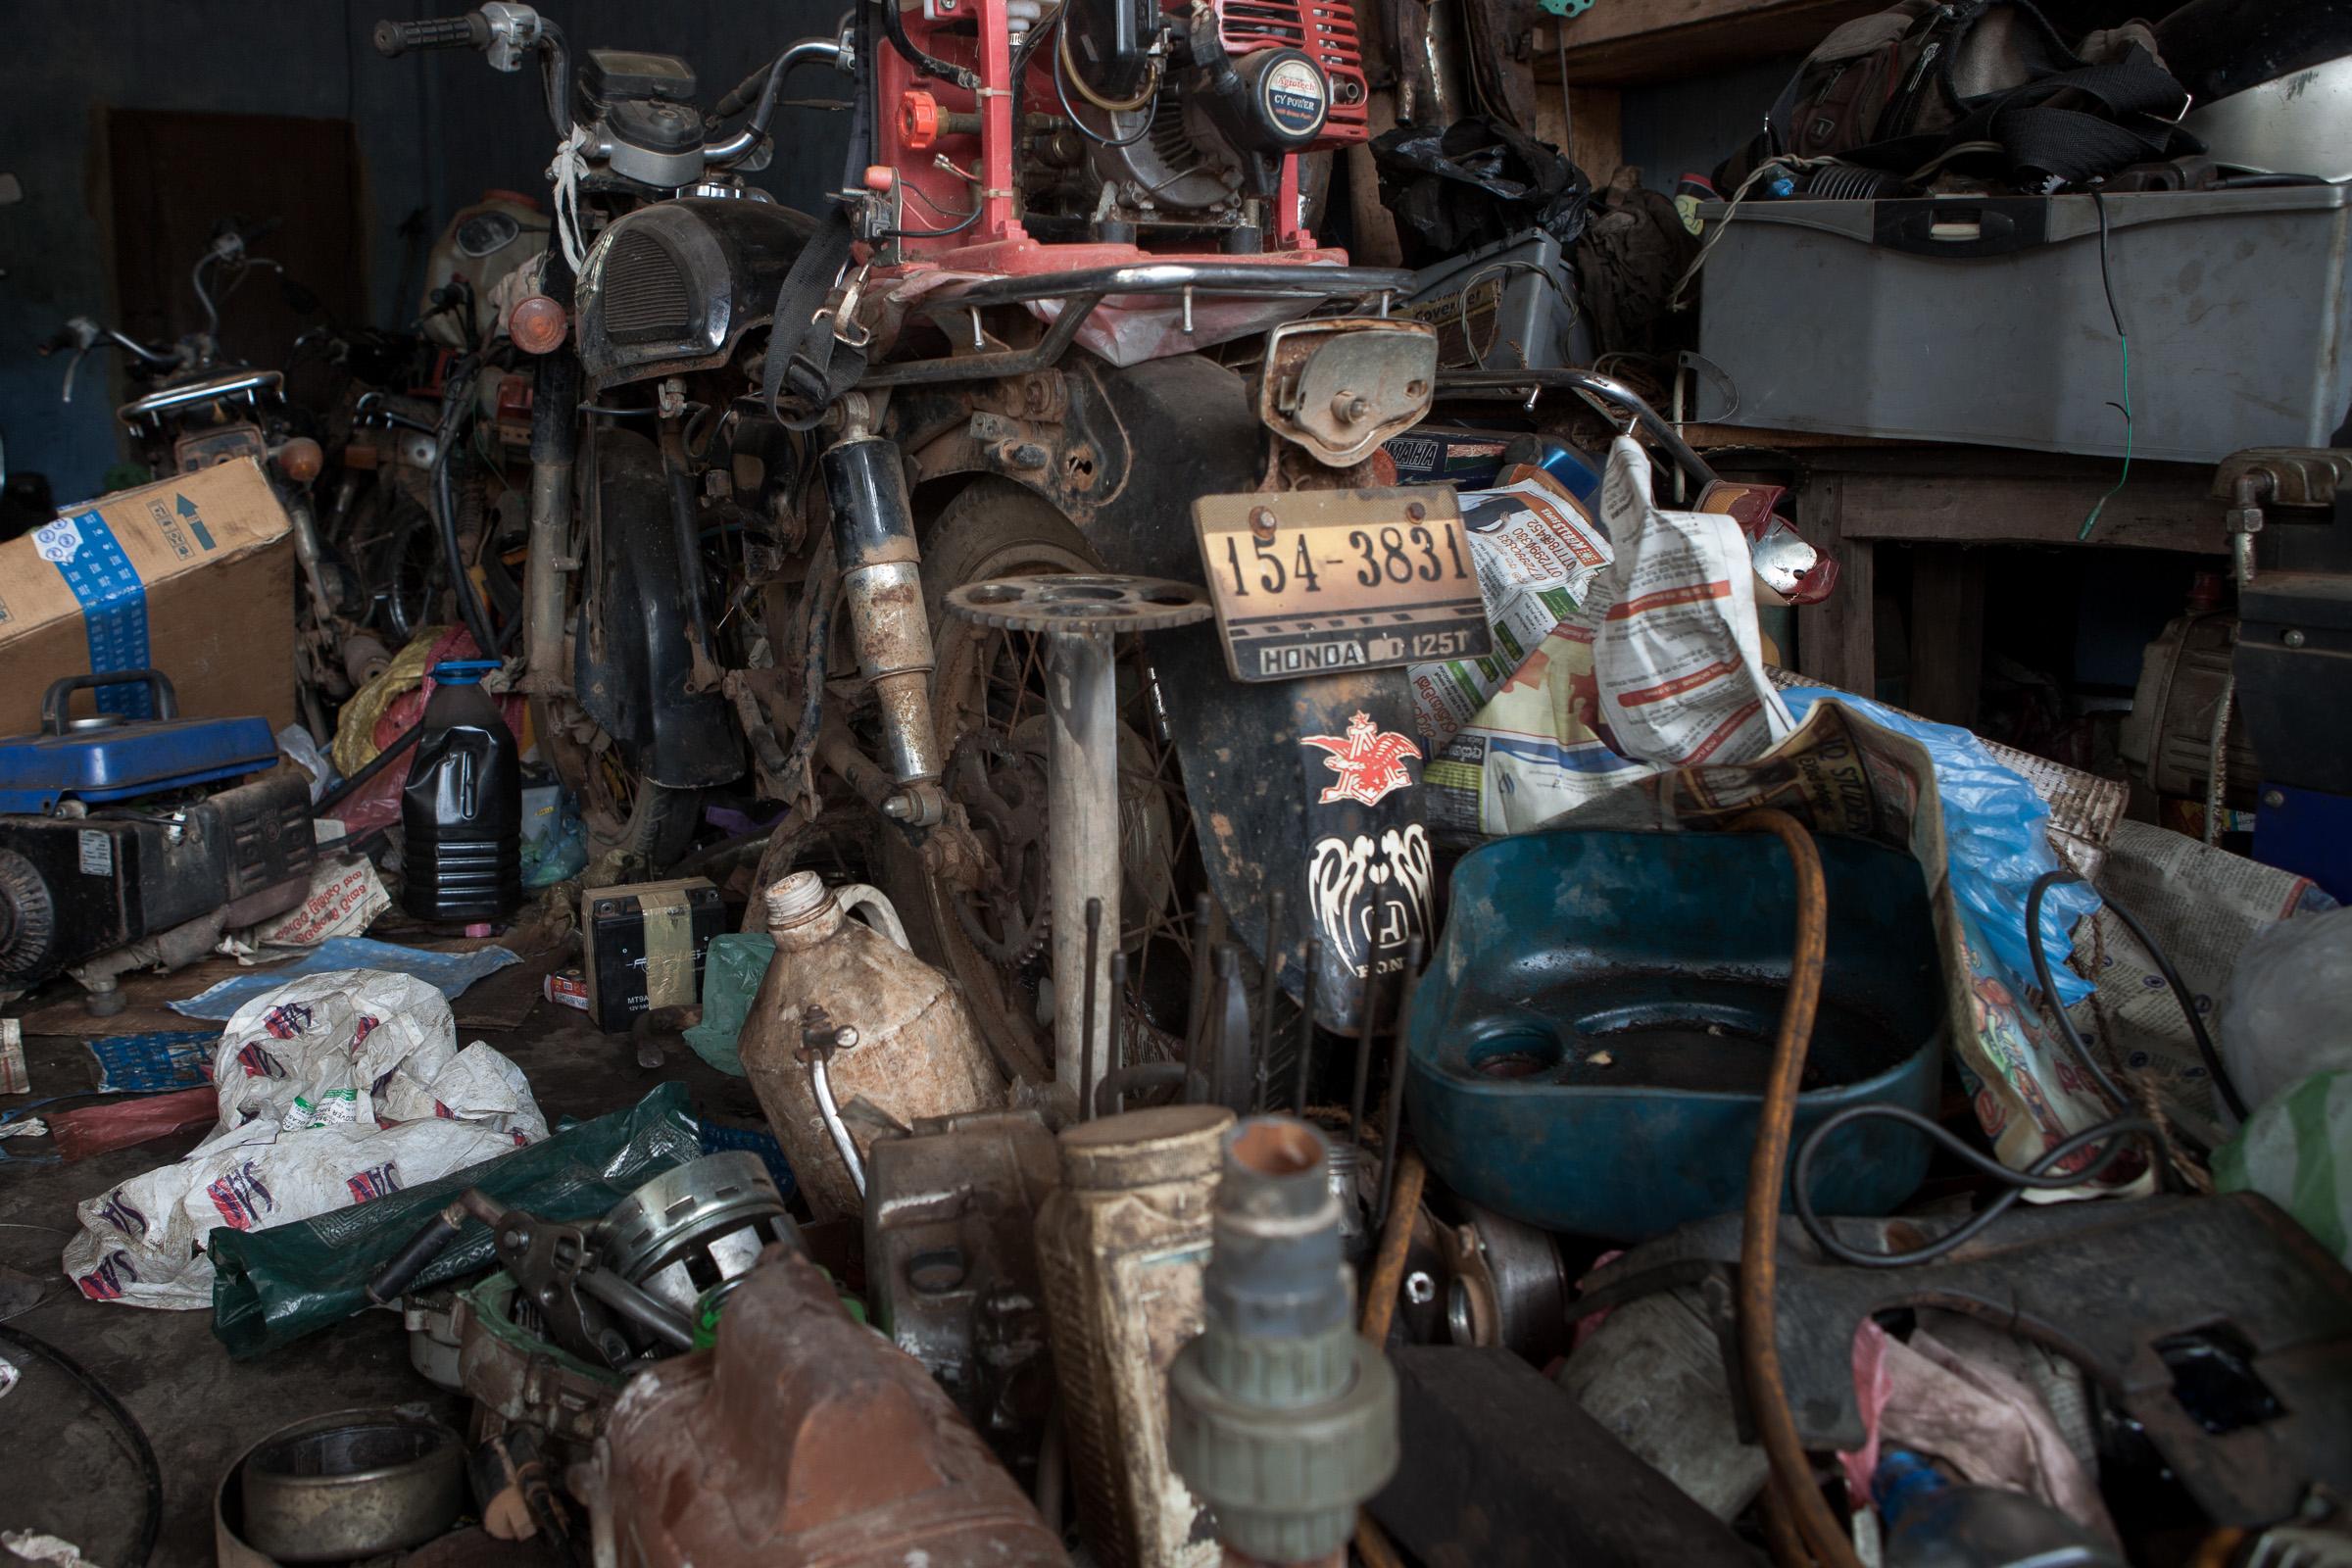 Junk in a motorcycle workshop